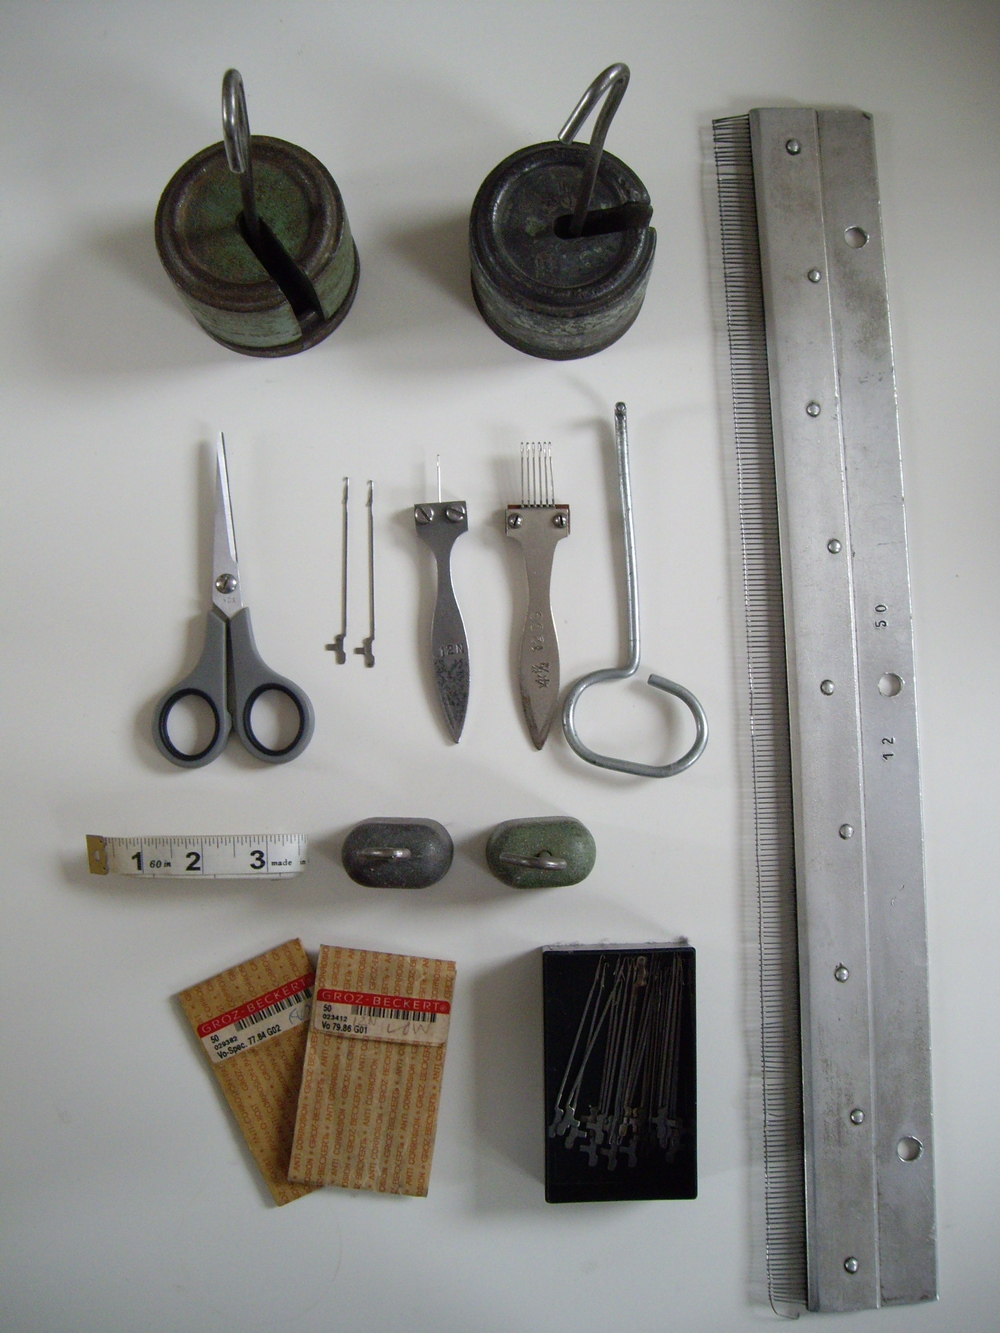 V-bed knitting tools